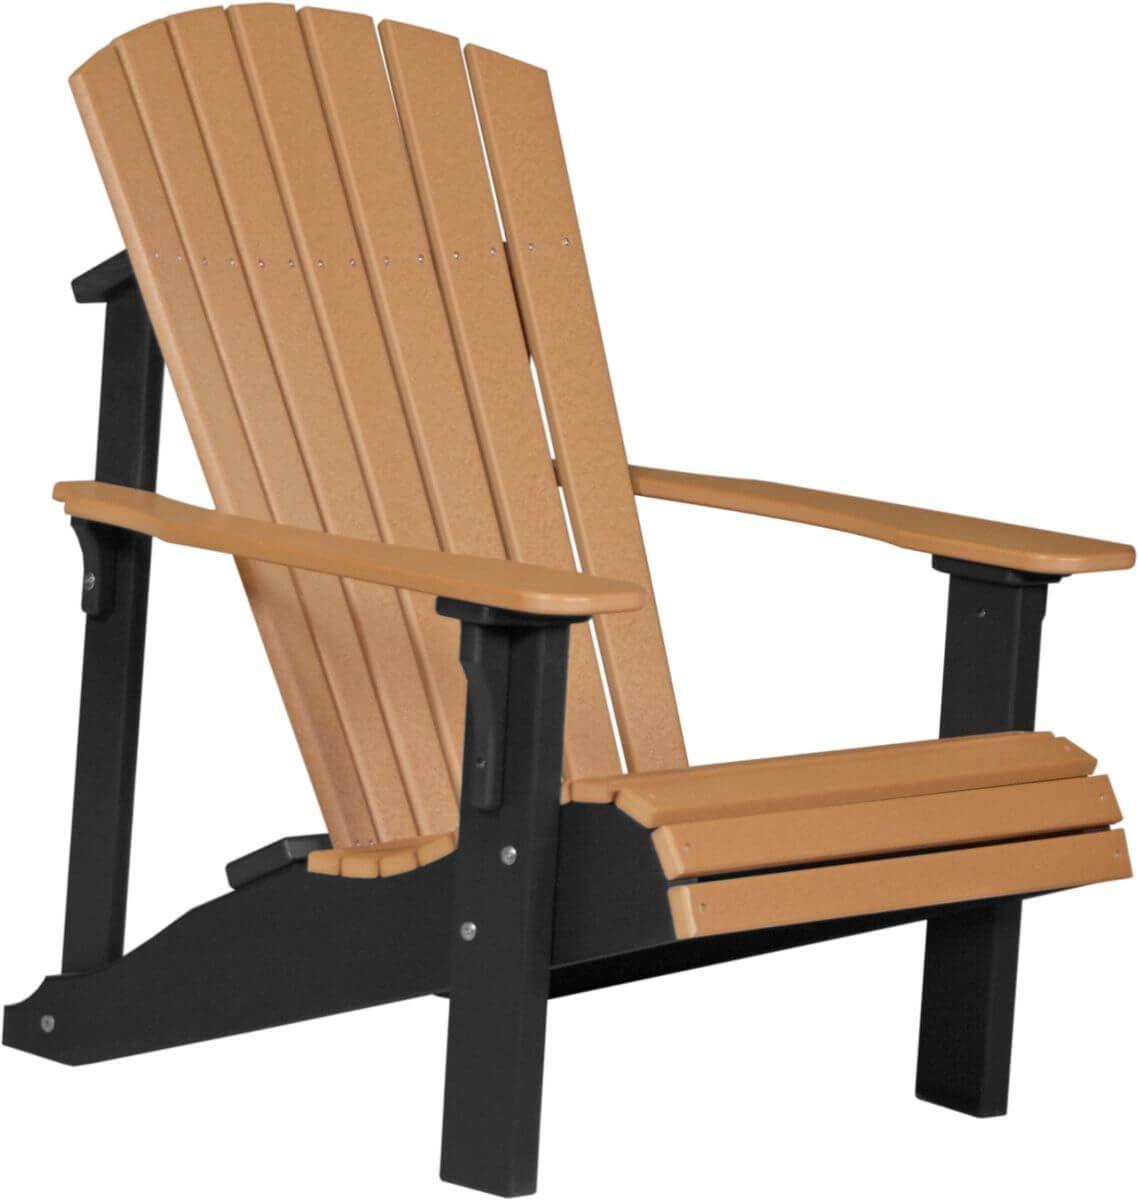 Cedar and Black Rockaway Adirondack Chair